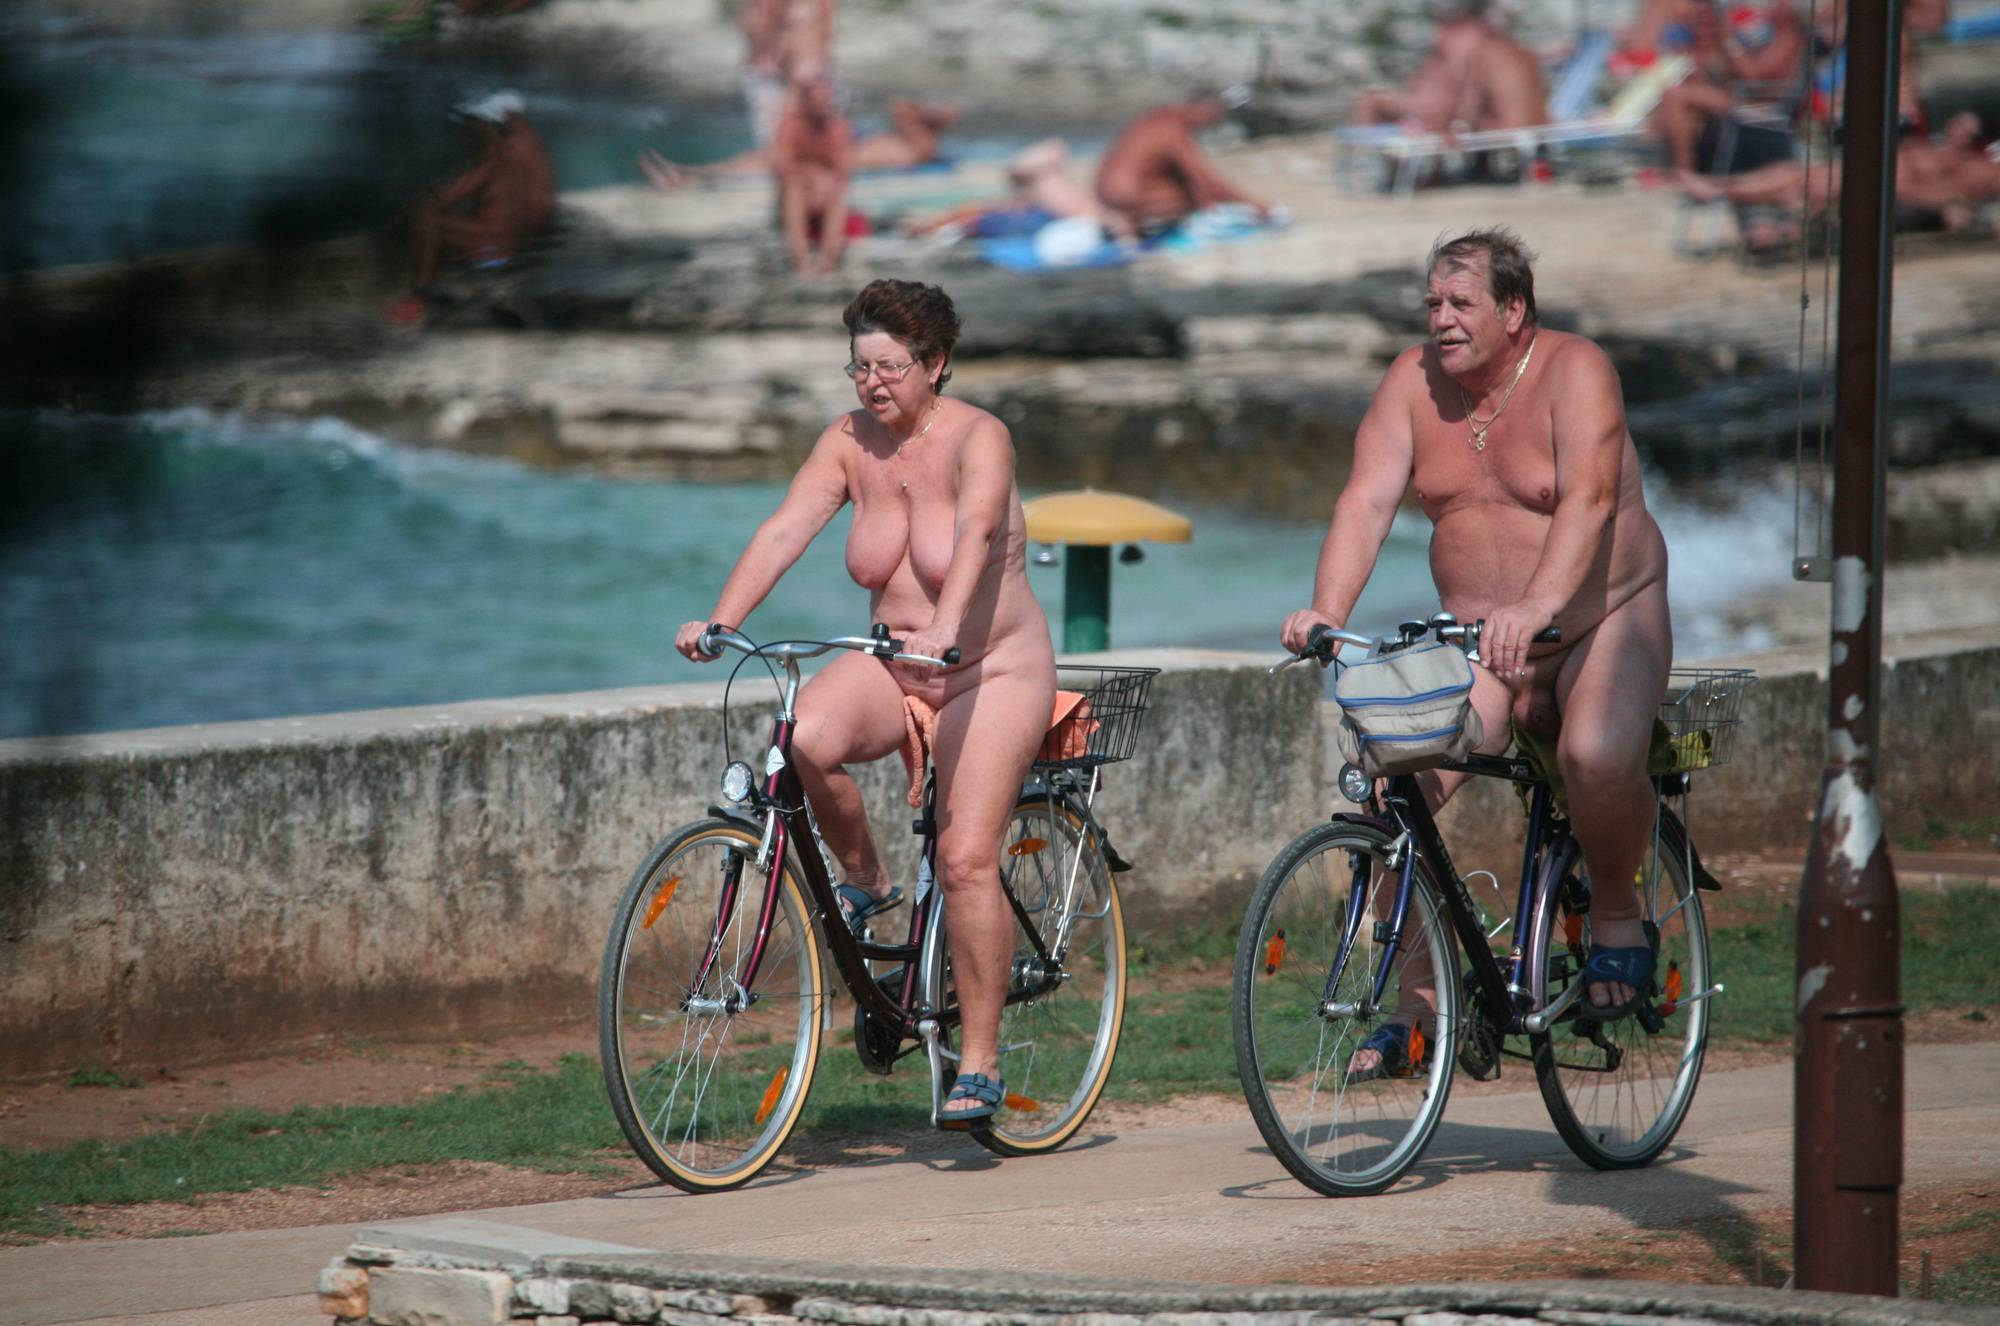 Crete Observed Bikers - 1